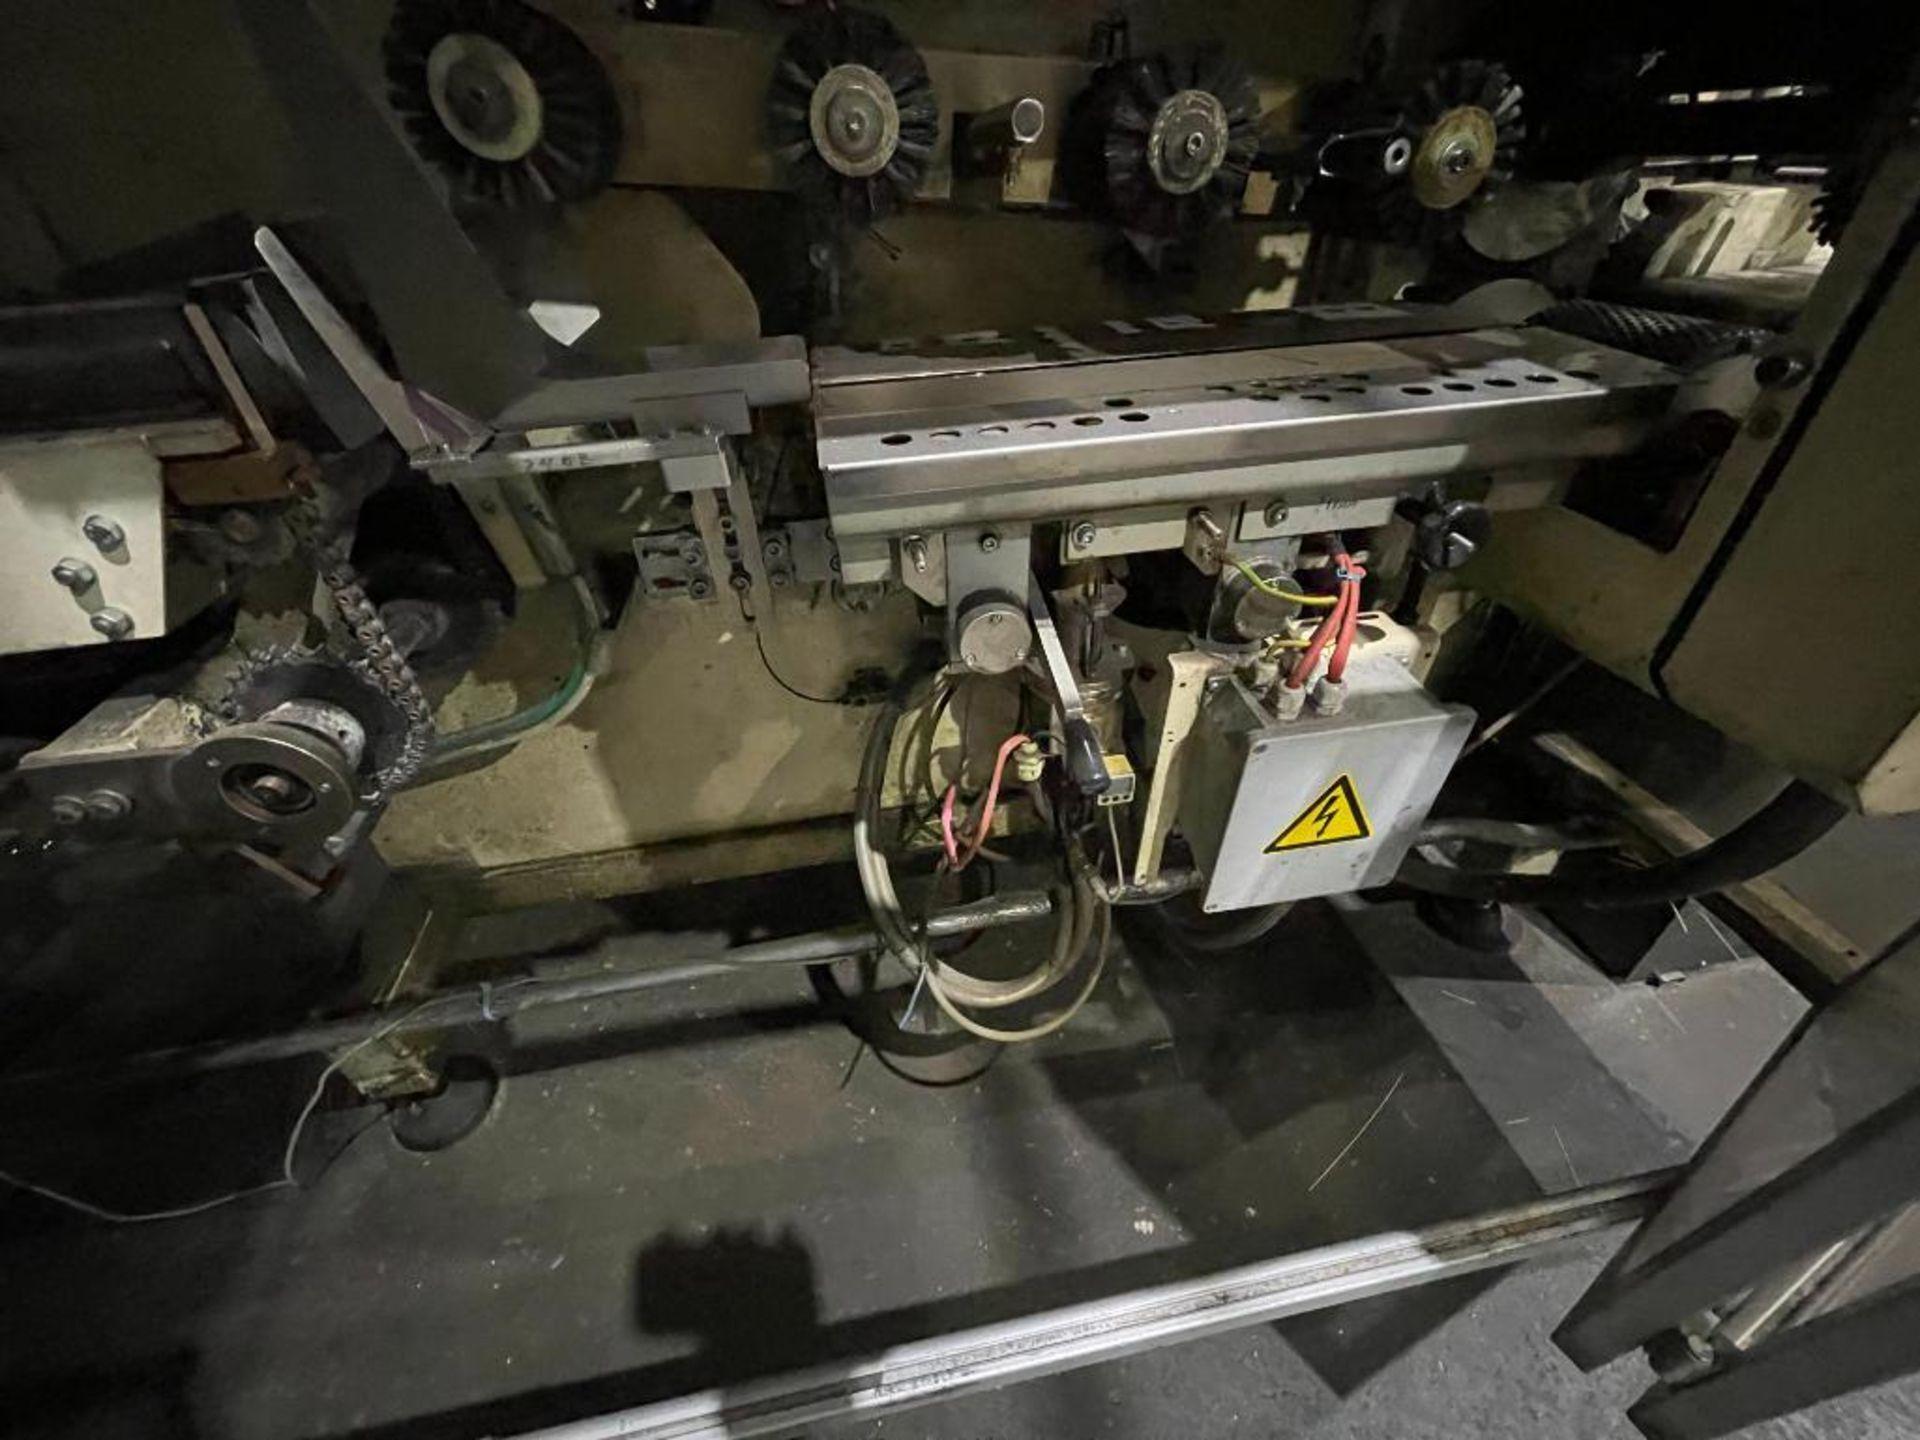 Stiavelli long goods horizontal flow wrapper - Image 12 of 53